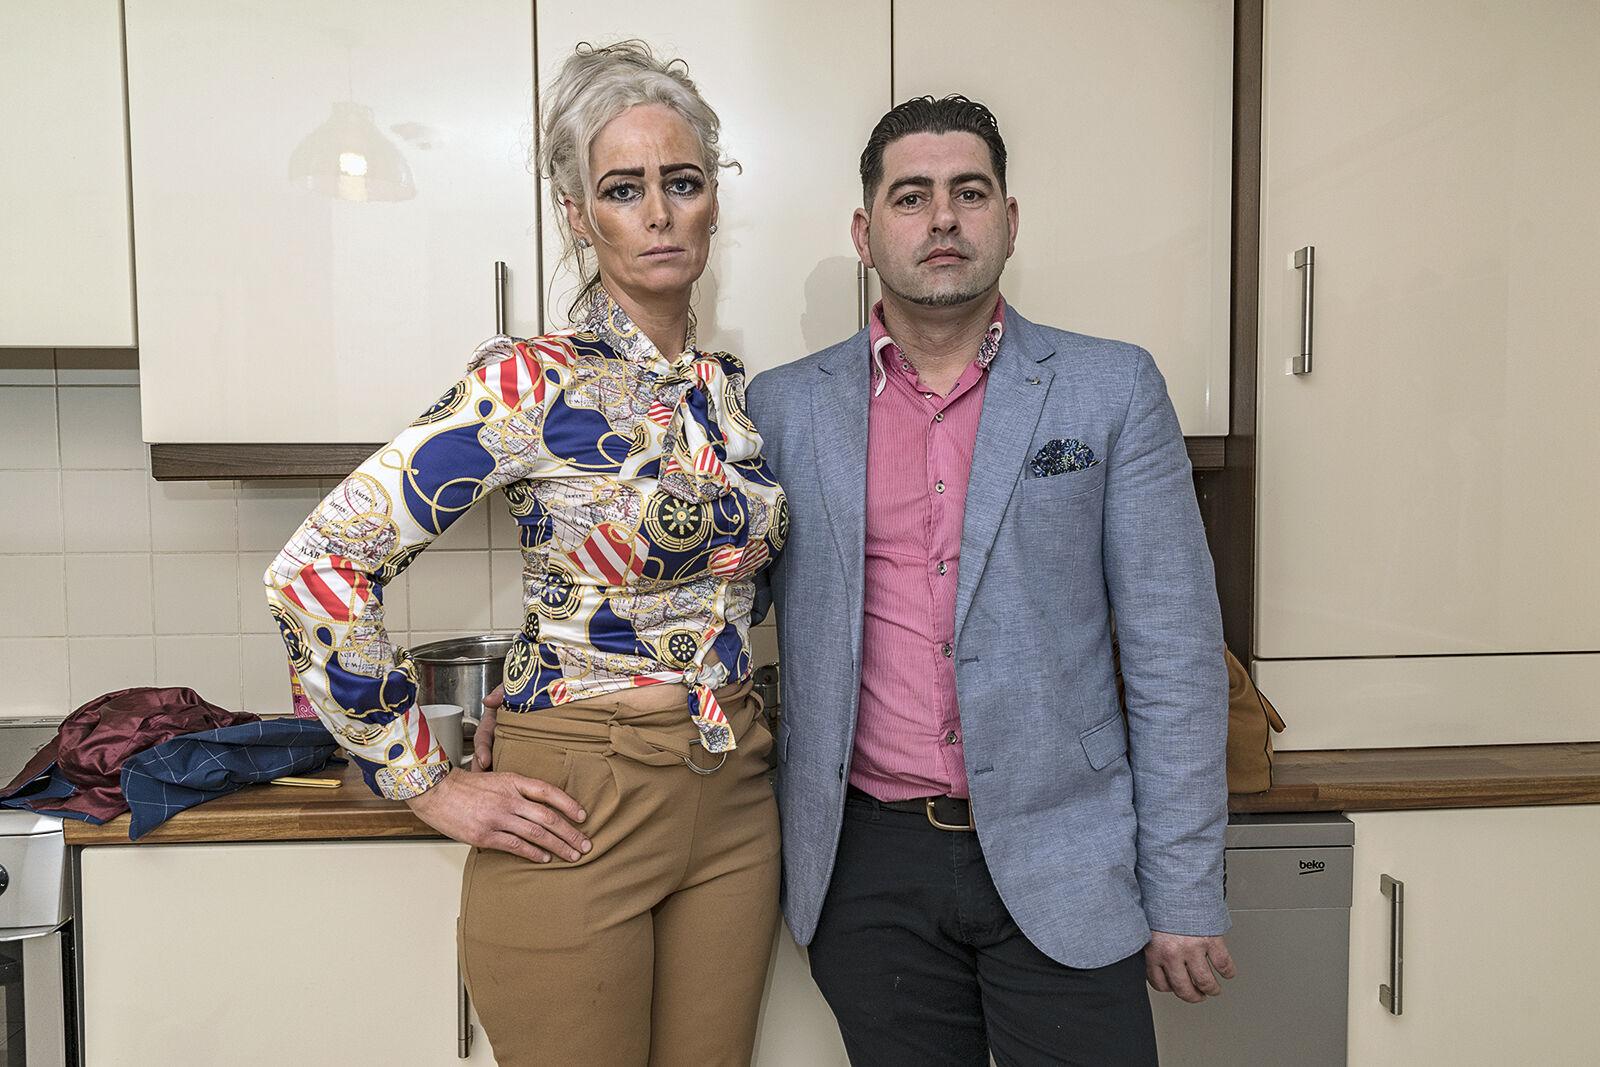 Nora and Paddy, Limerick, Ireland 2020